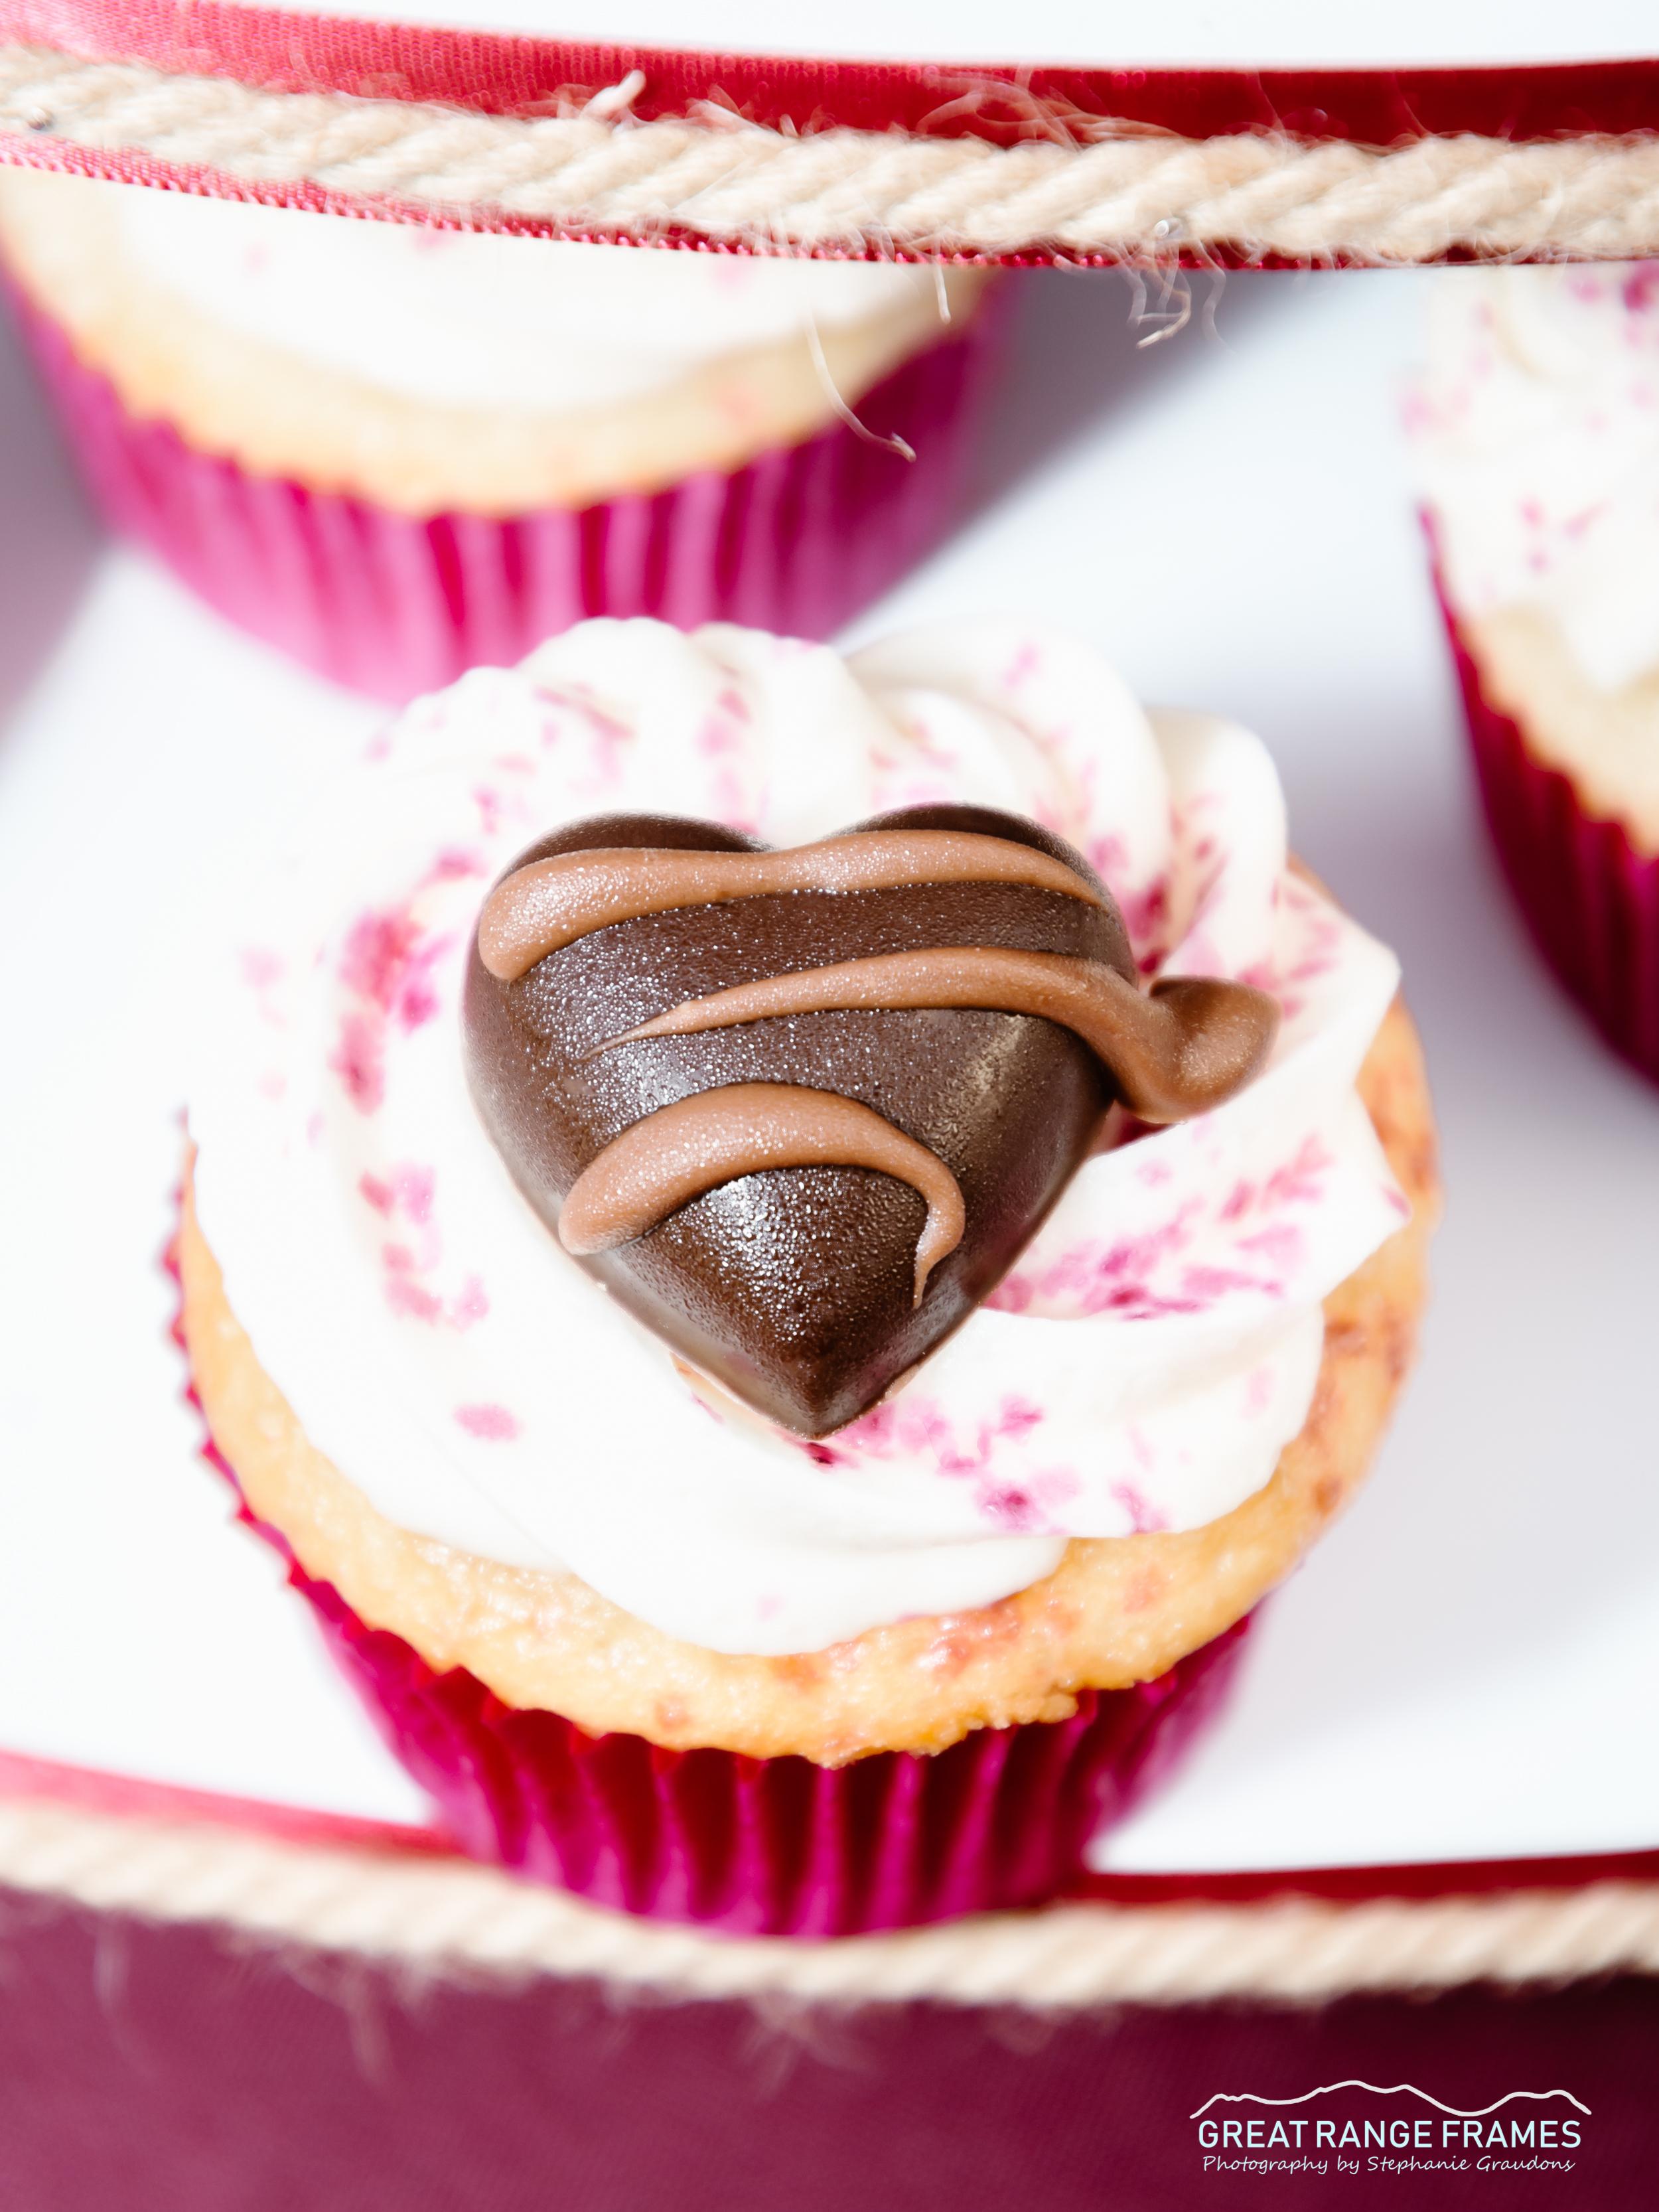 WM-Graudons-Wedding-cupcake-3249.jpg